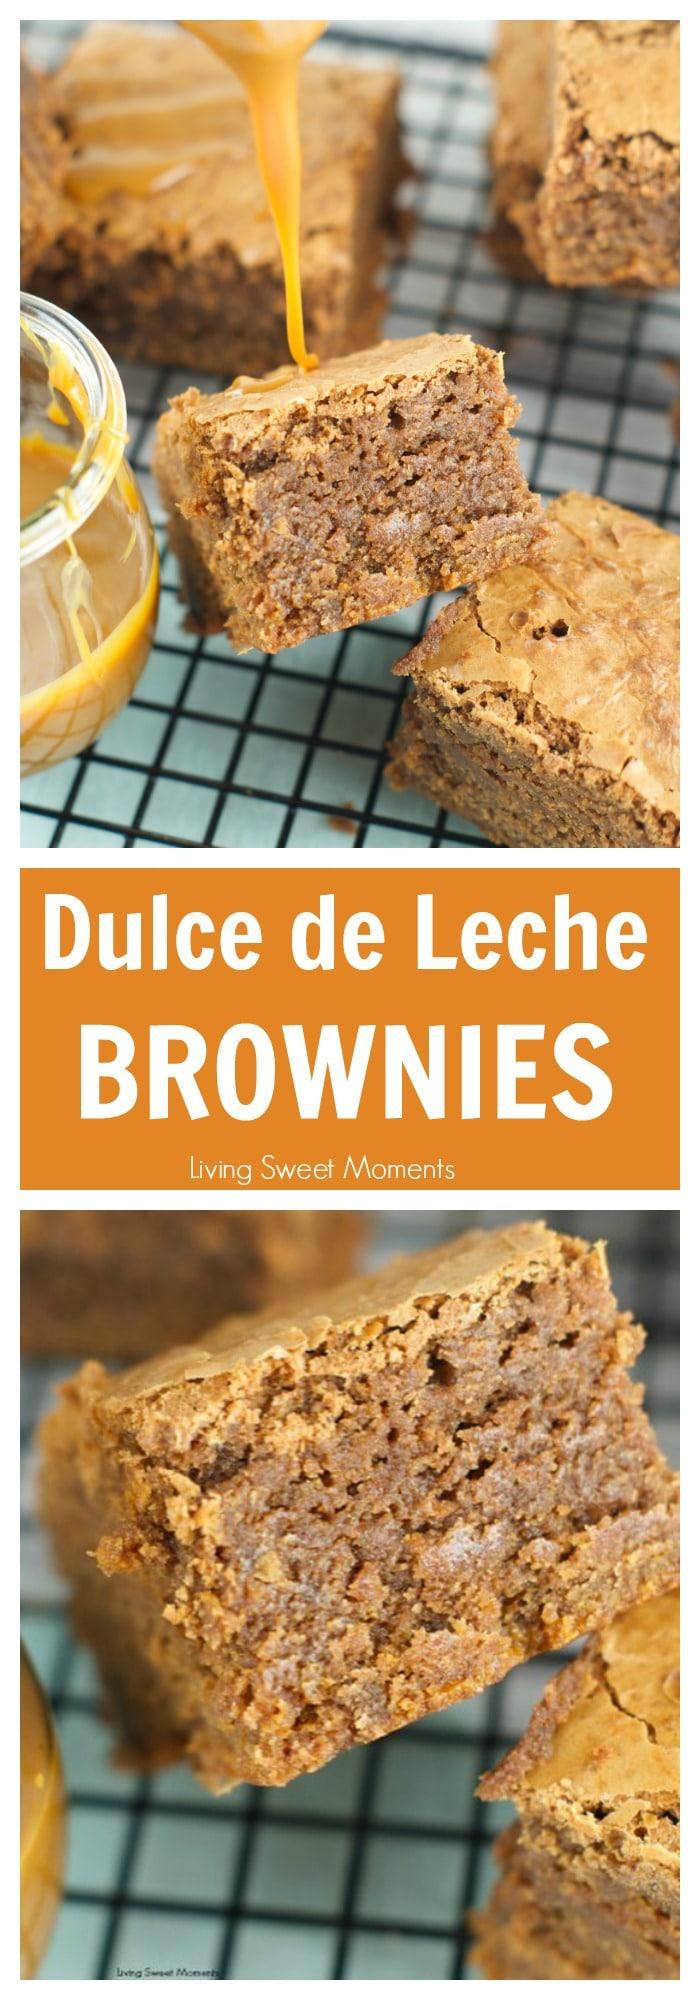 print dulce de leche brownies dulce de leche brownies ooey gooey fudgy ...